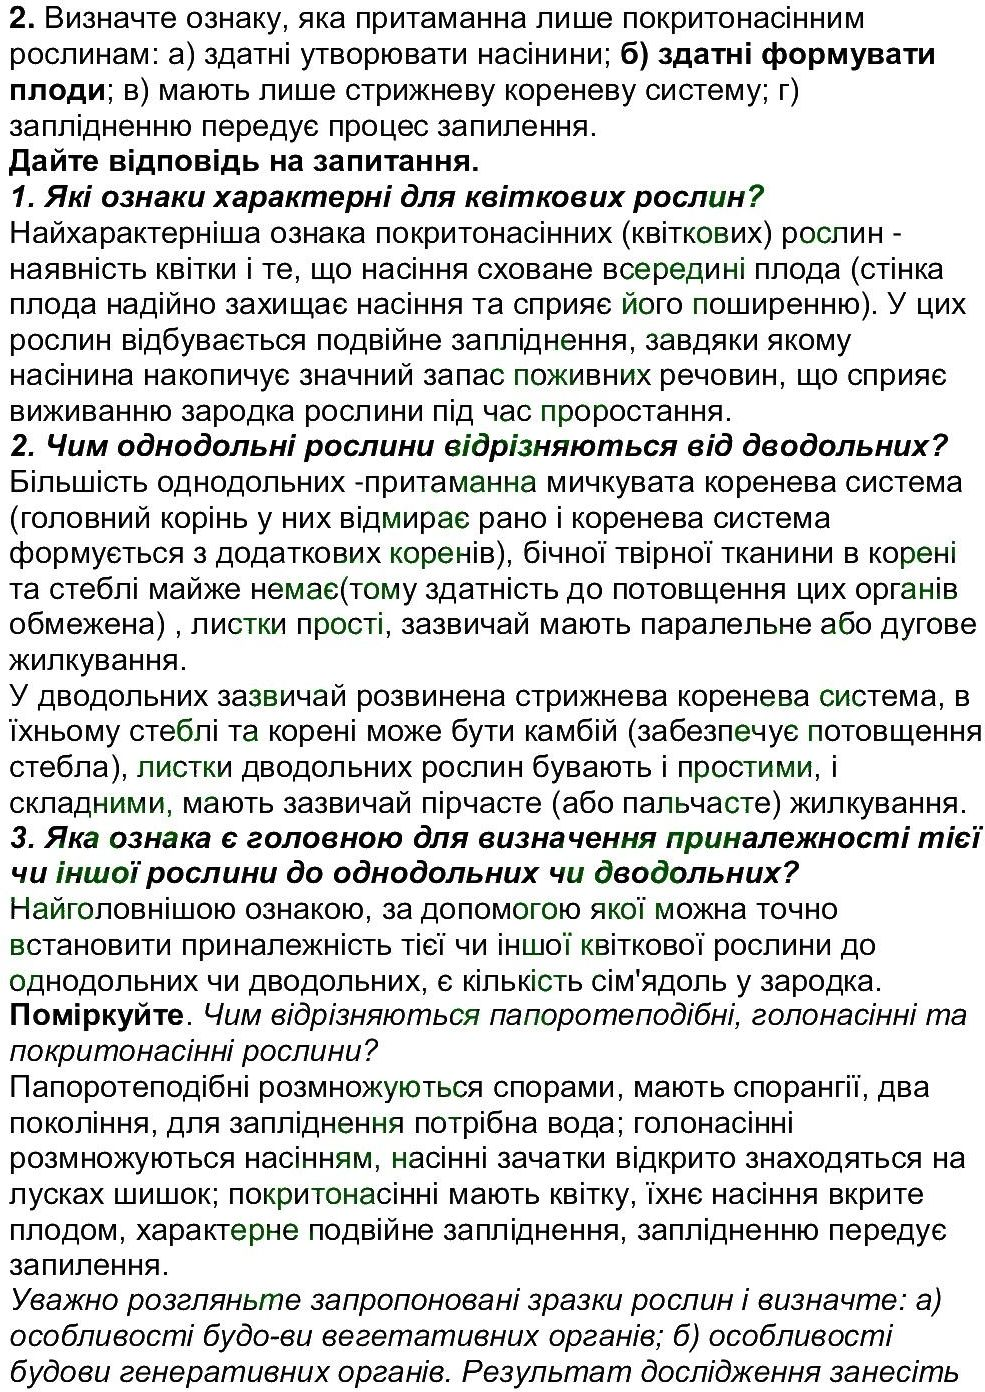 6-biologiya-li-ostapchenko-pg-balan-nyu-matyash-2016--tema-4-riznomanitnist-roslin-ст168-170-rnd5630.jpg